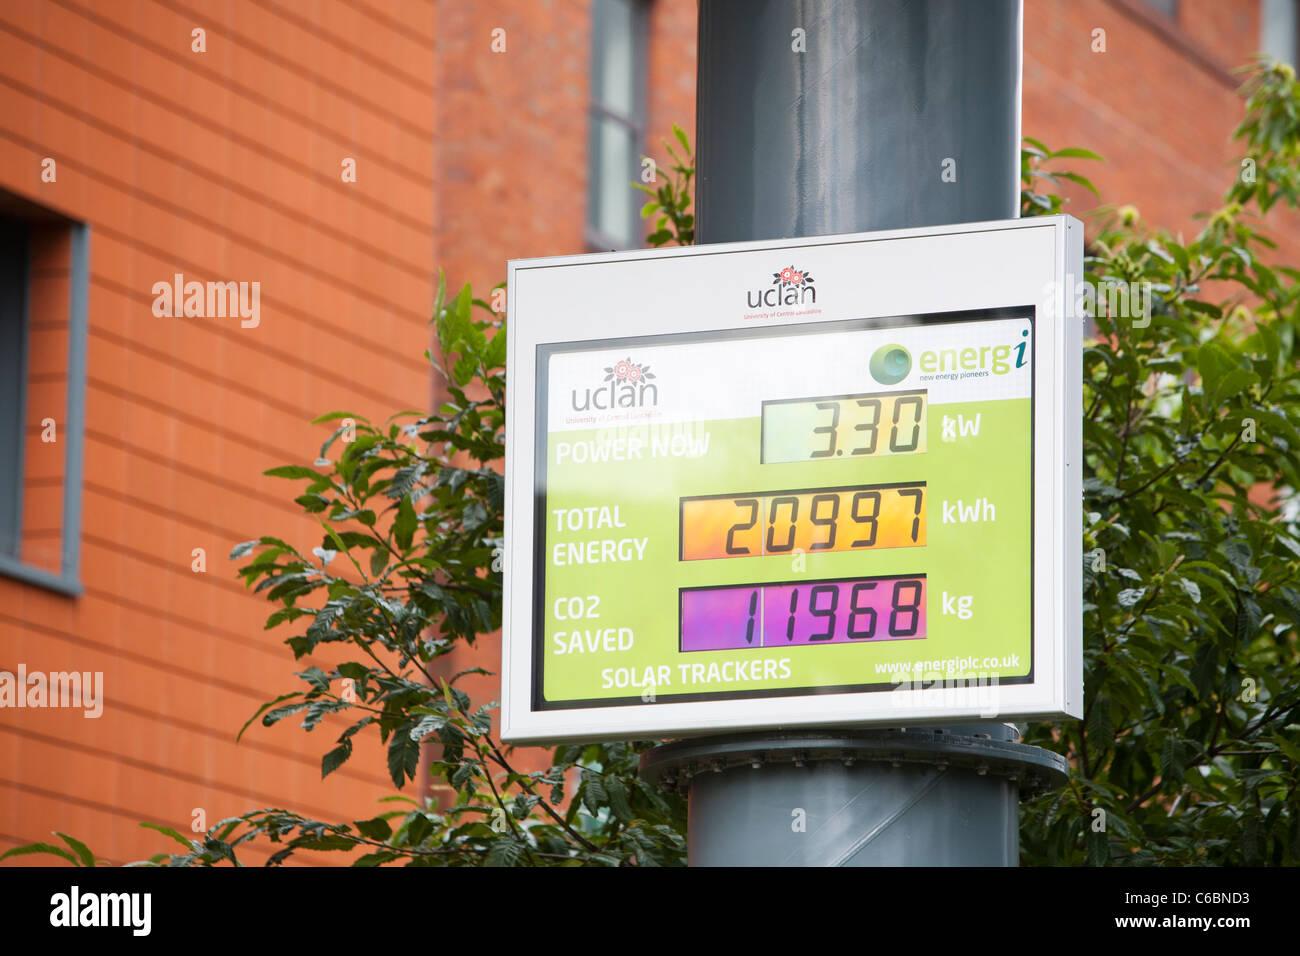 A tracking solar photovoltaic panel on the campus of UCLAN, the University of Centrsl Lancashire, Preston, UK. - Stock Image